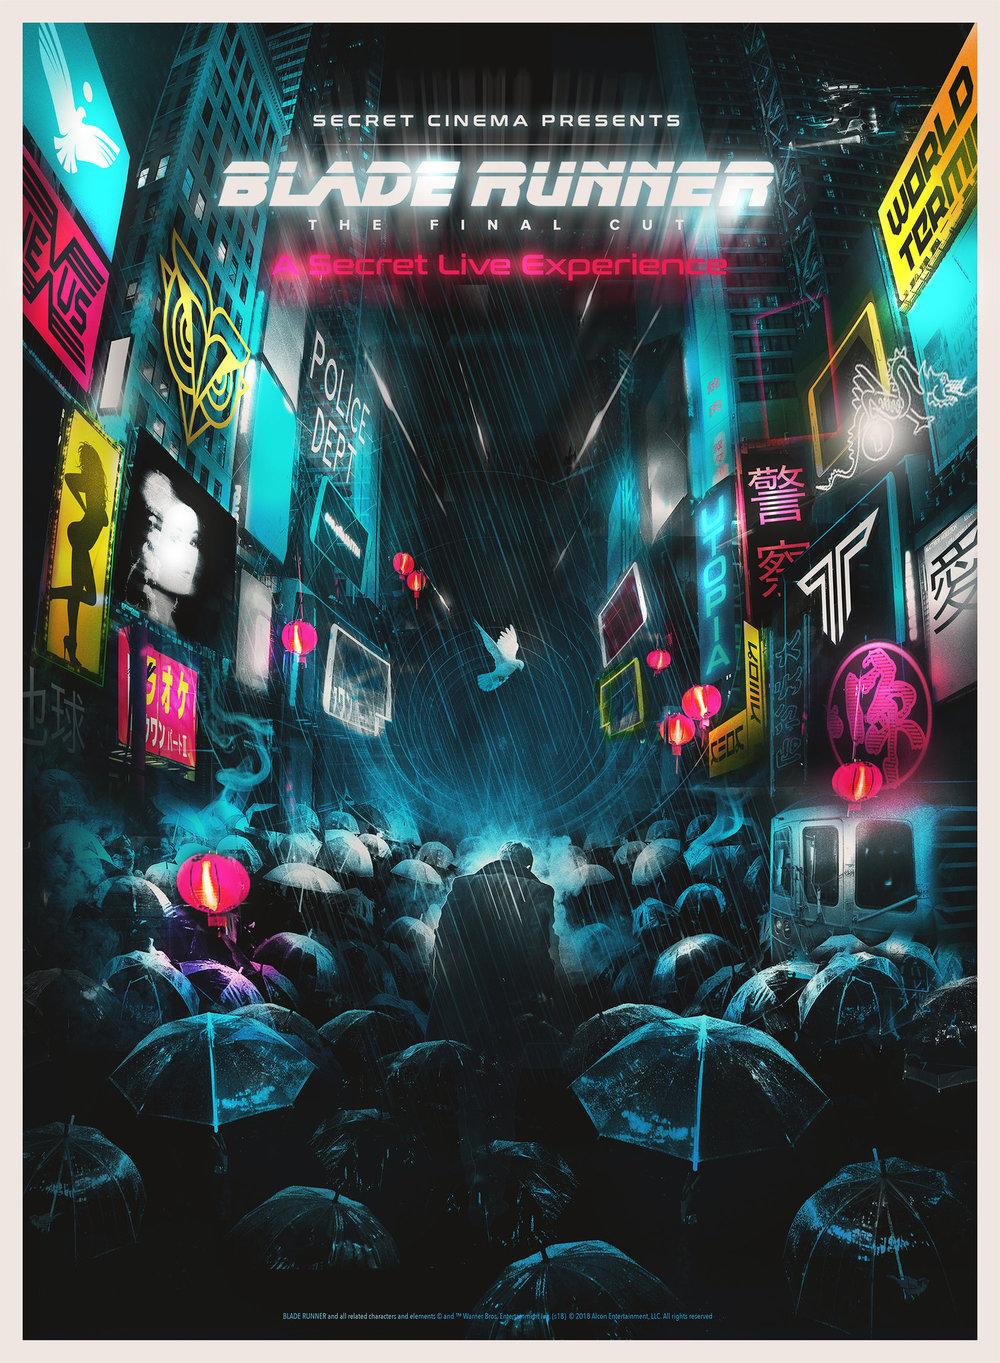 Secret Cinema Presents Blade Runner